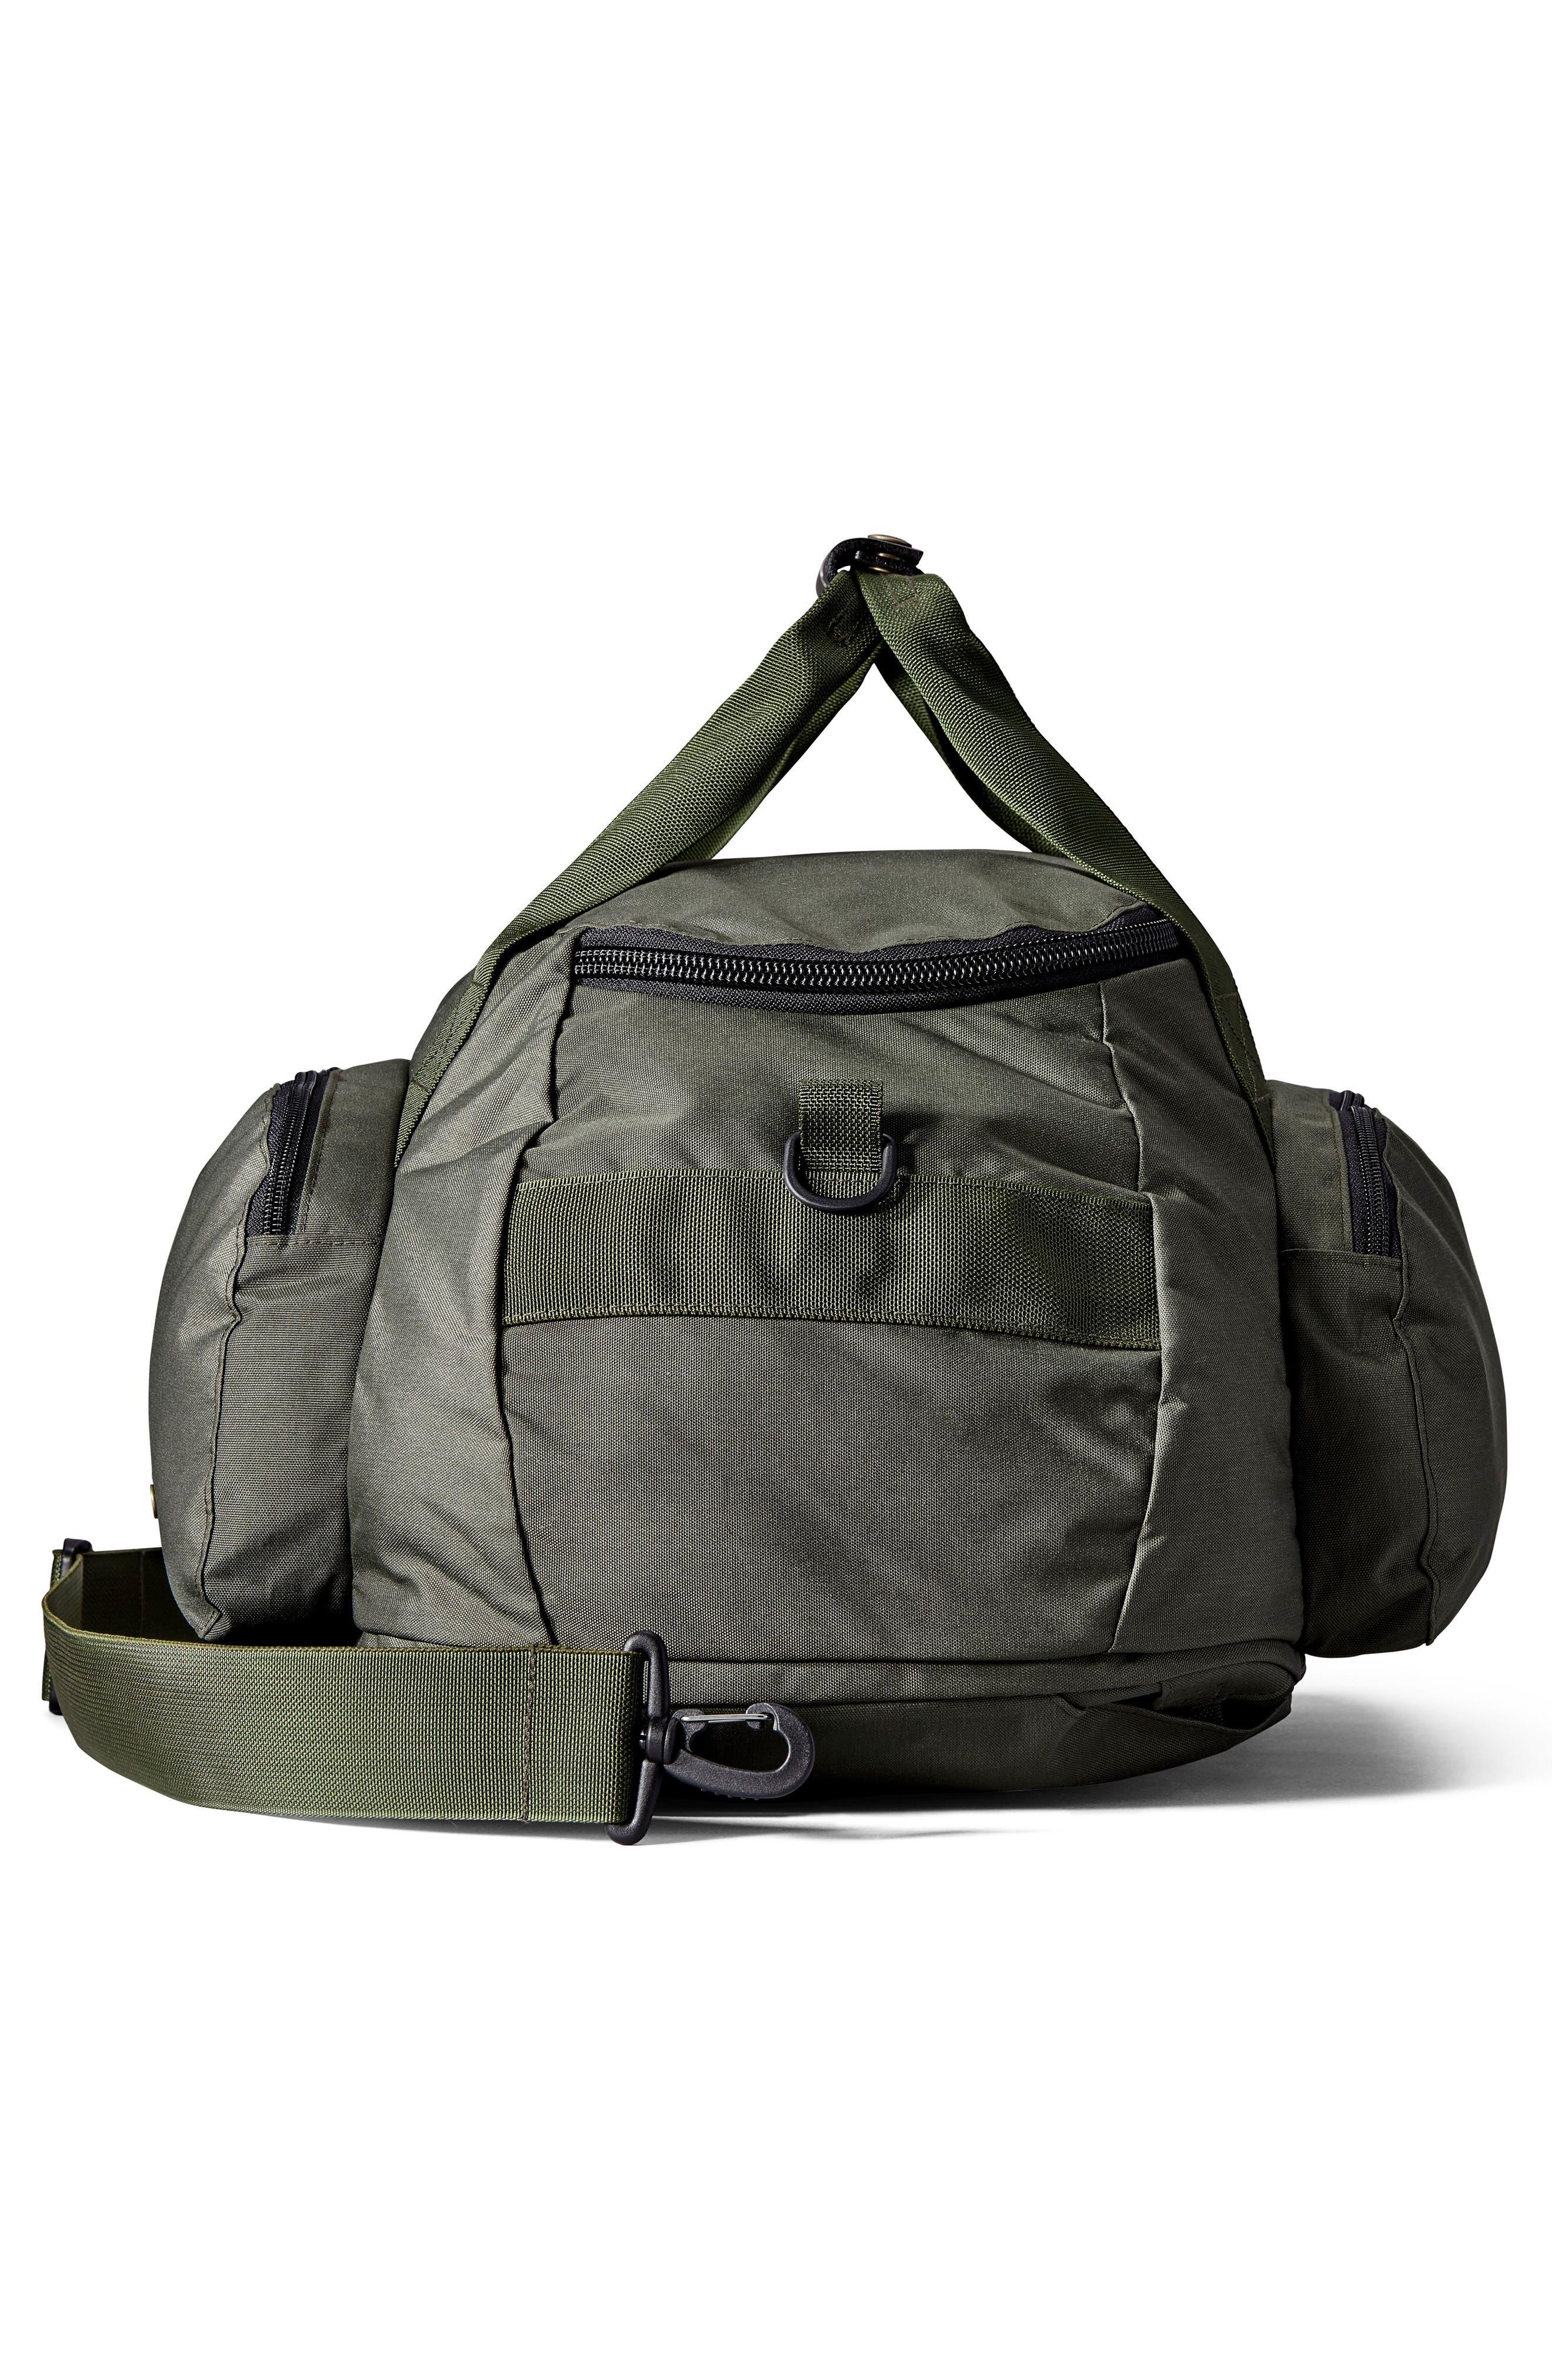 Convertible Duffel Bag,                             Alternate thumbnail 7, color,                             Otter Green